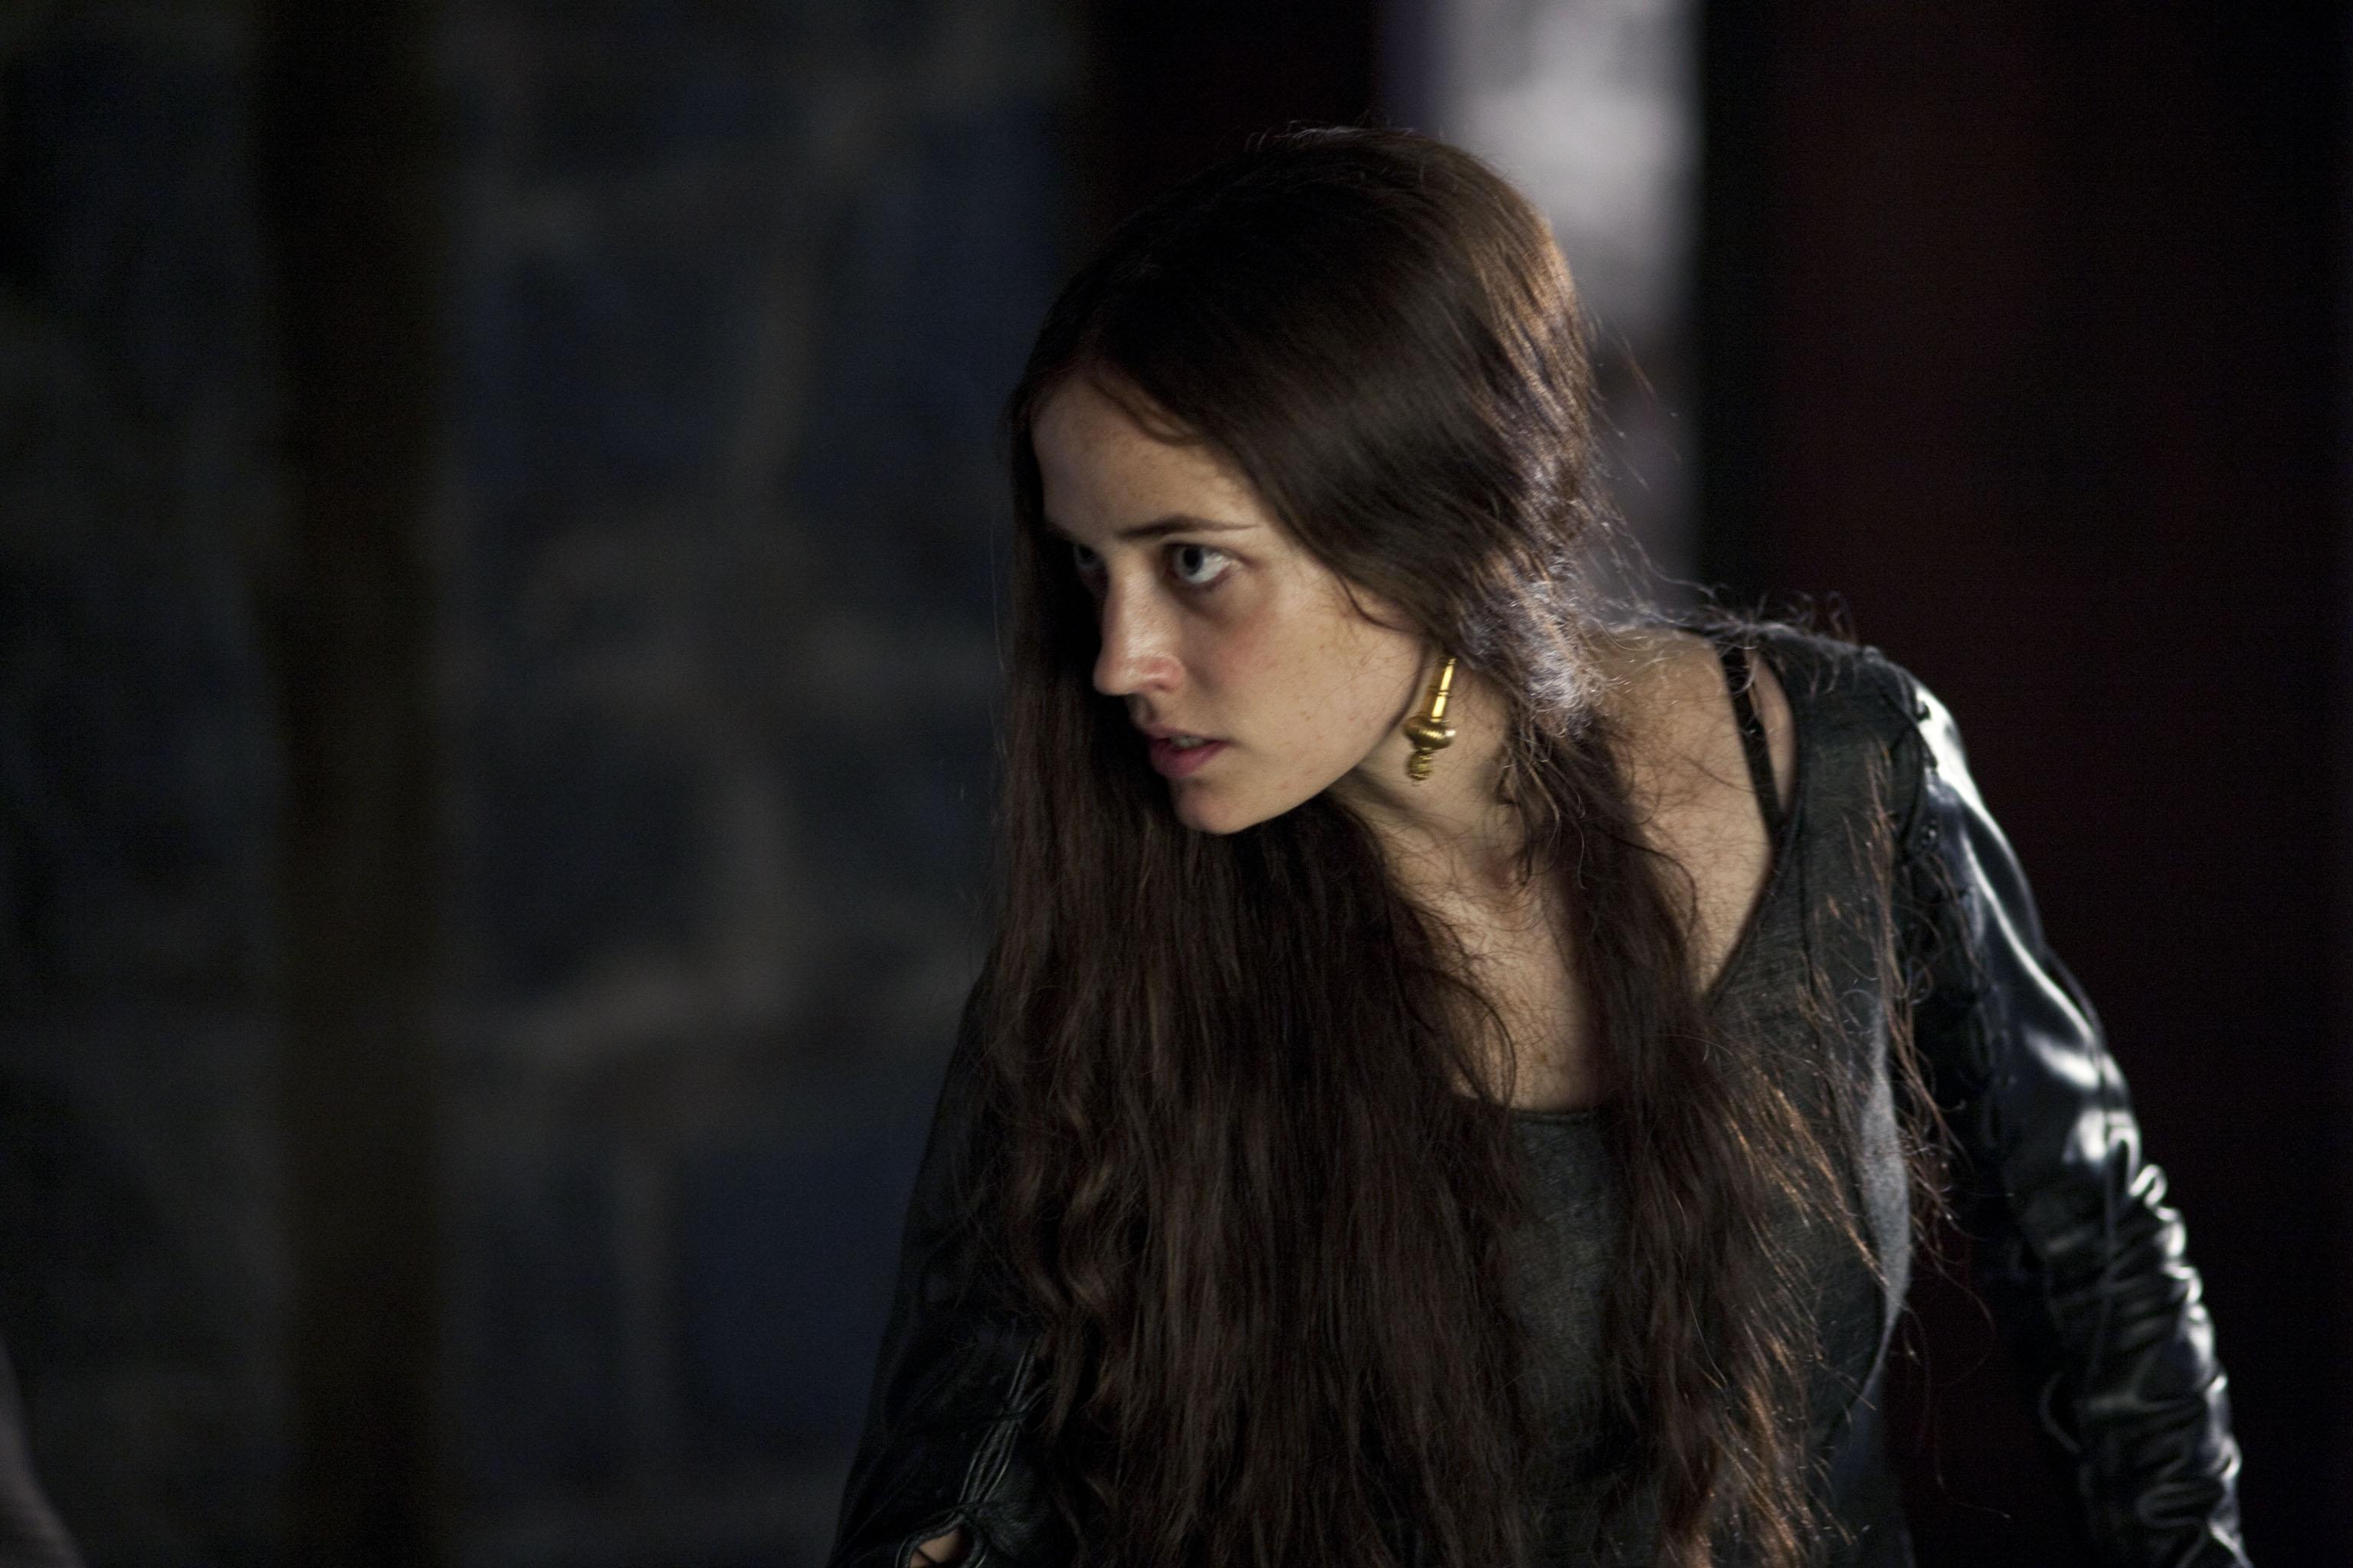 Camelot Photoshoots And Stills Additions Eva Green Web